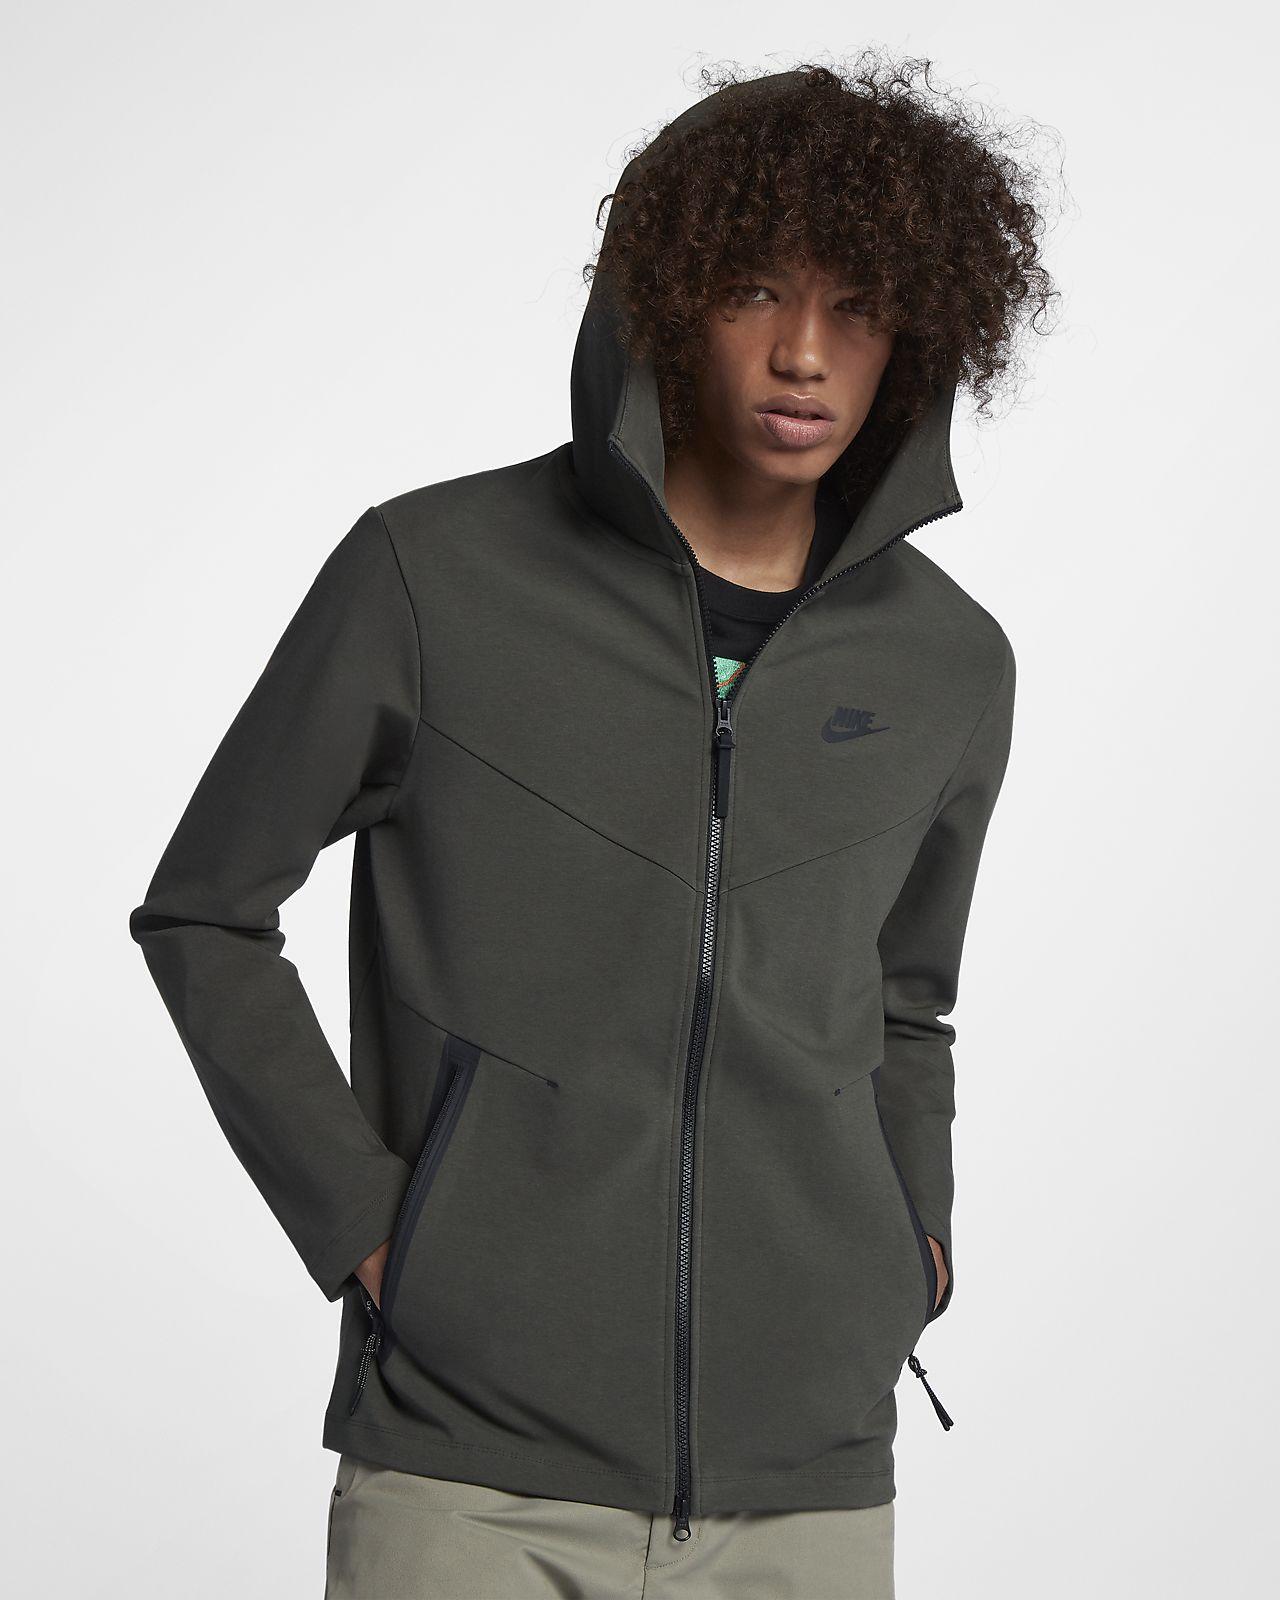 c6da3b4aba9a Nike Sportswear Tech Pack Men s Full-Zip Hoodie. Nike.com GB